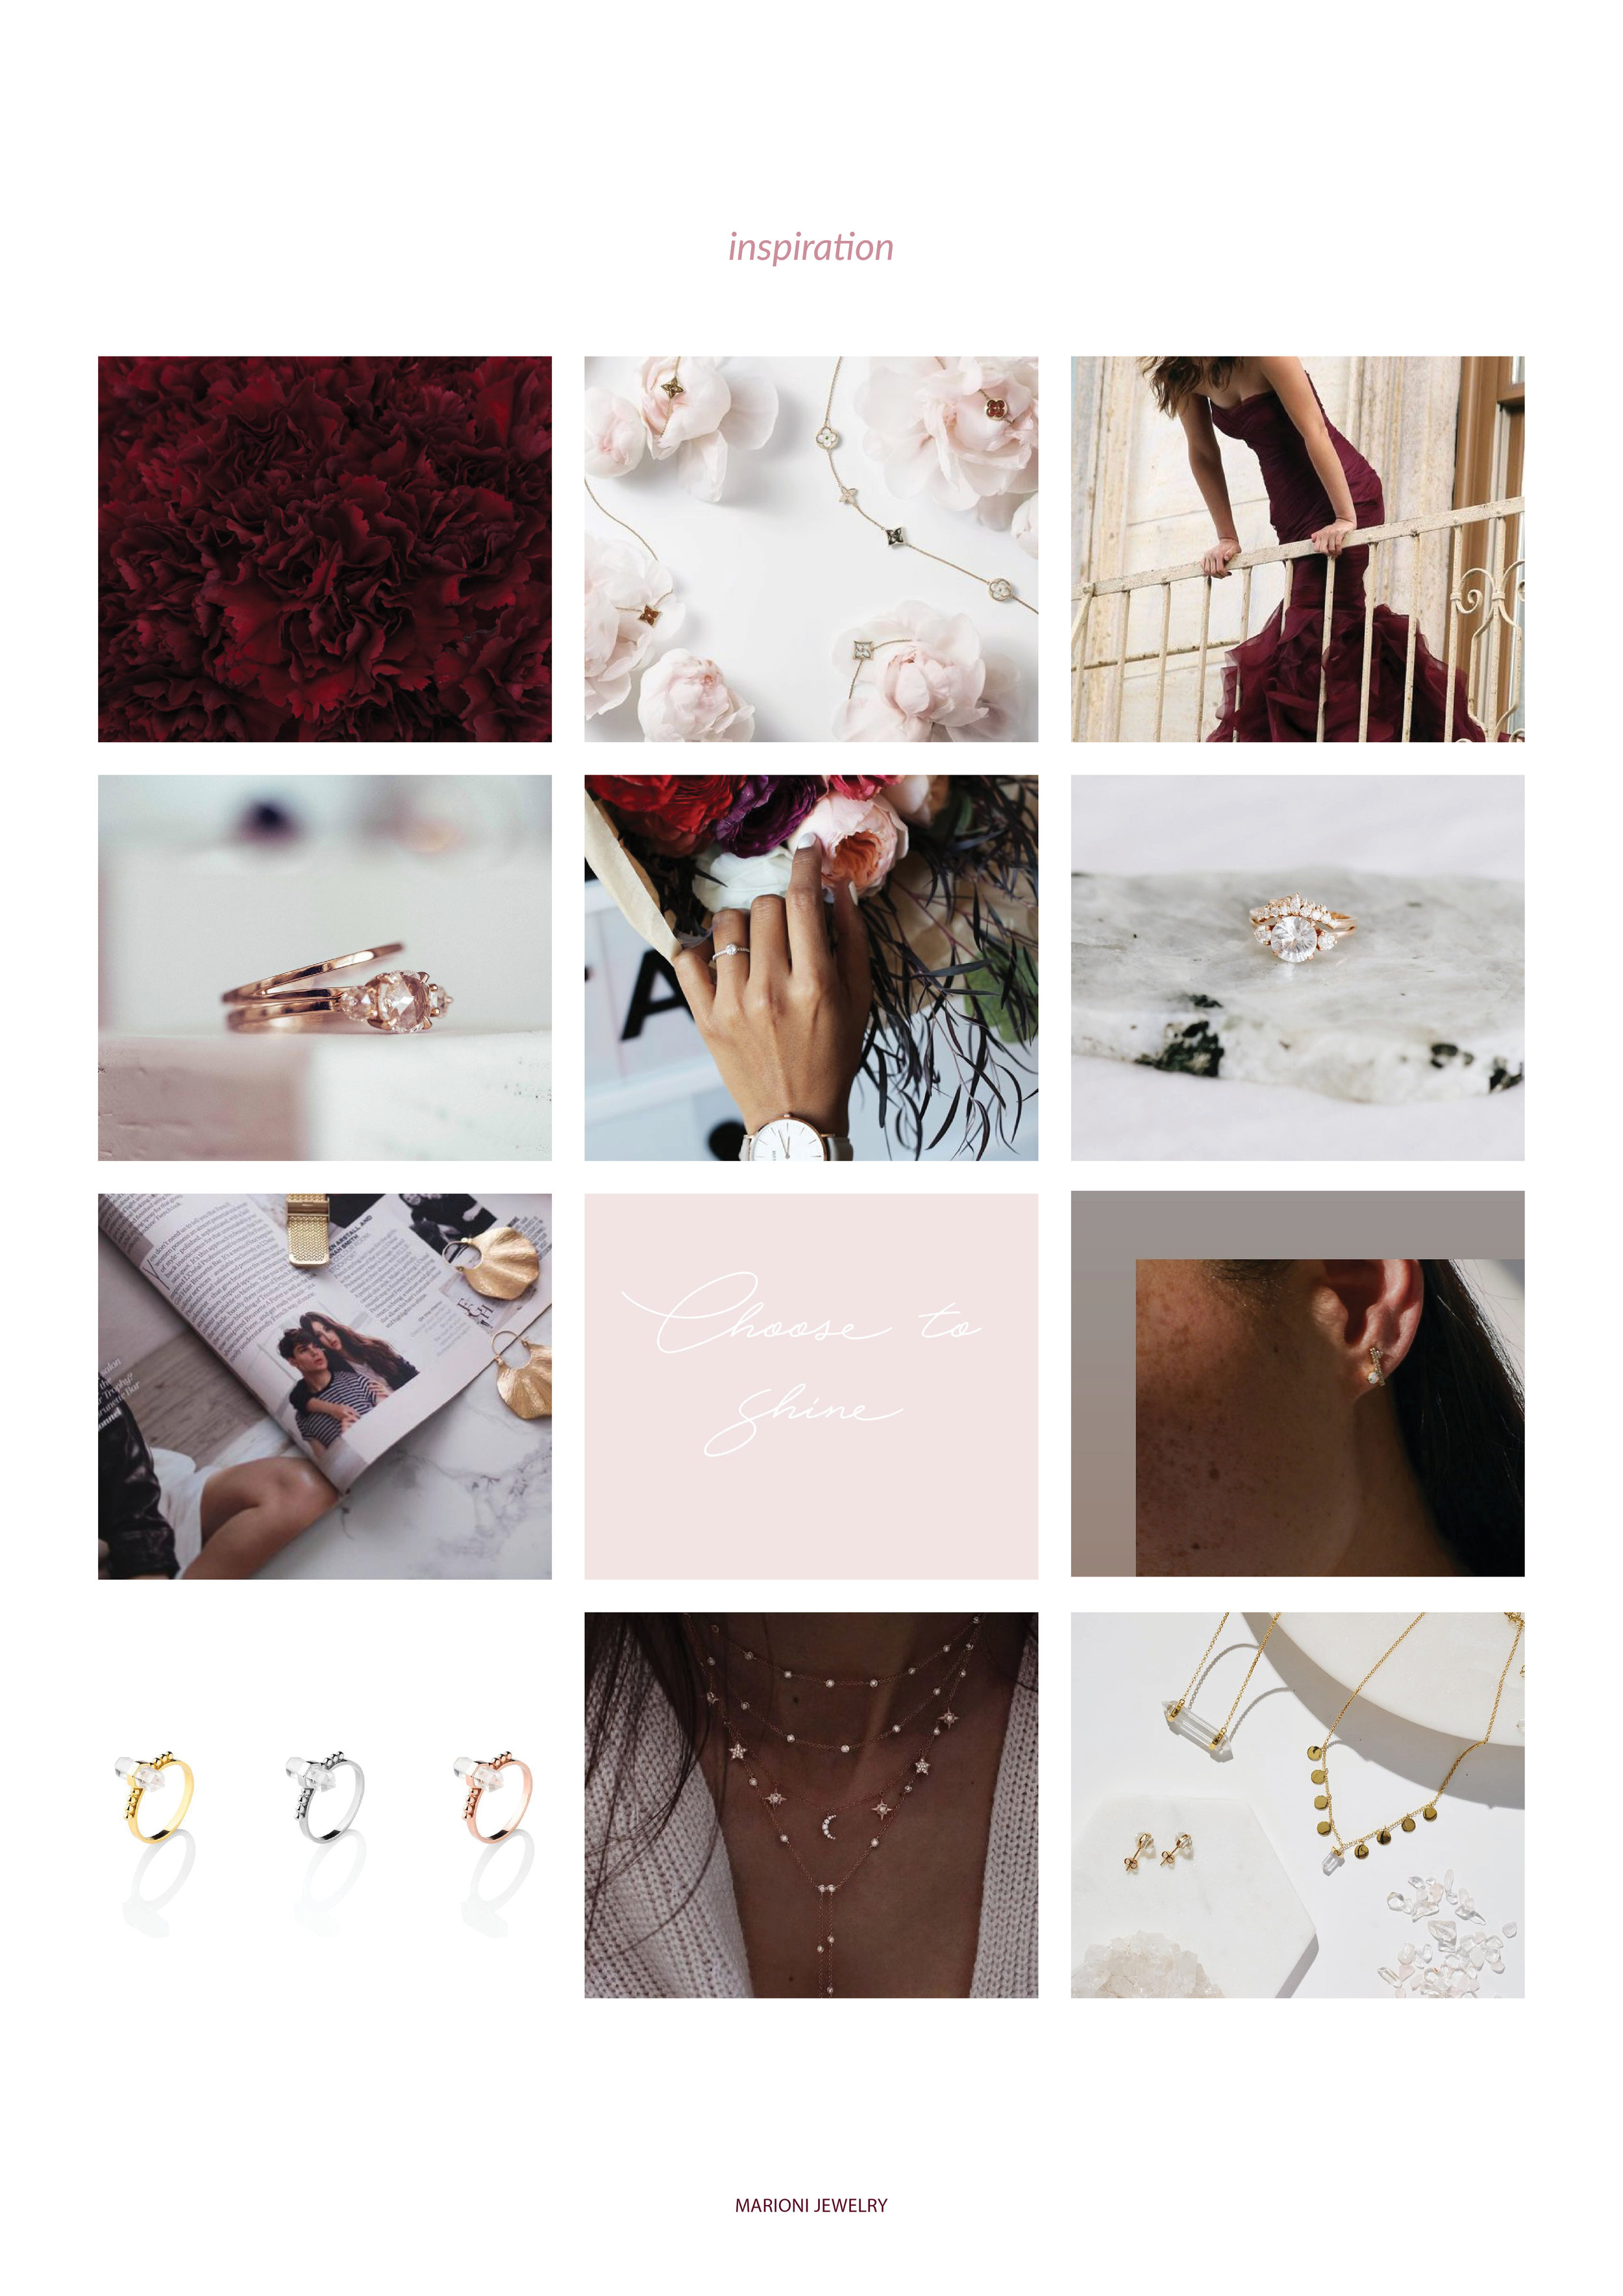 Marioni_Jewelry_Lookbook5.jpg